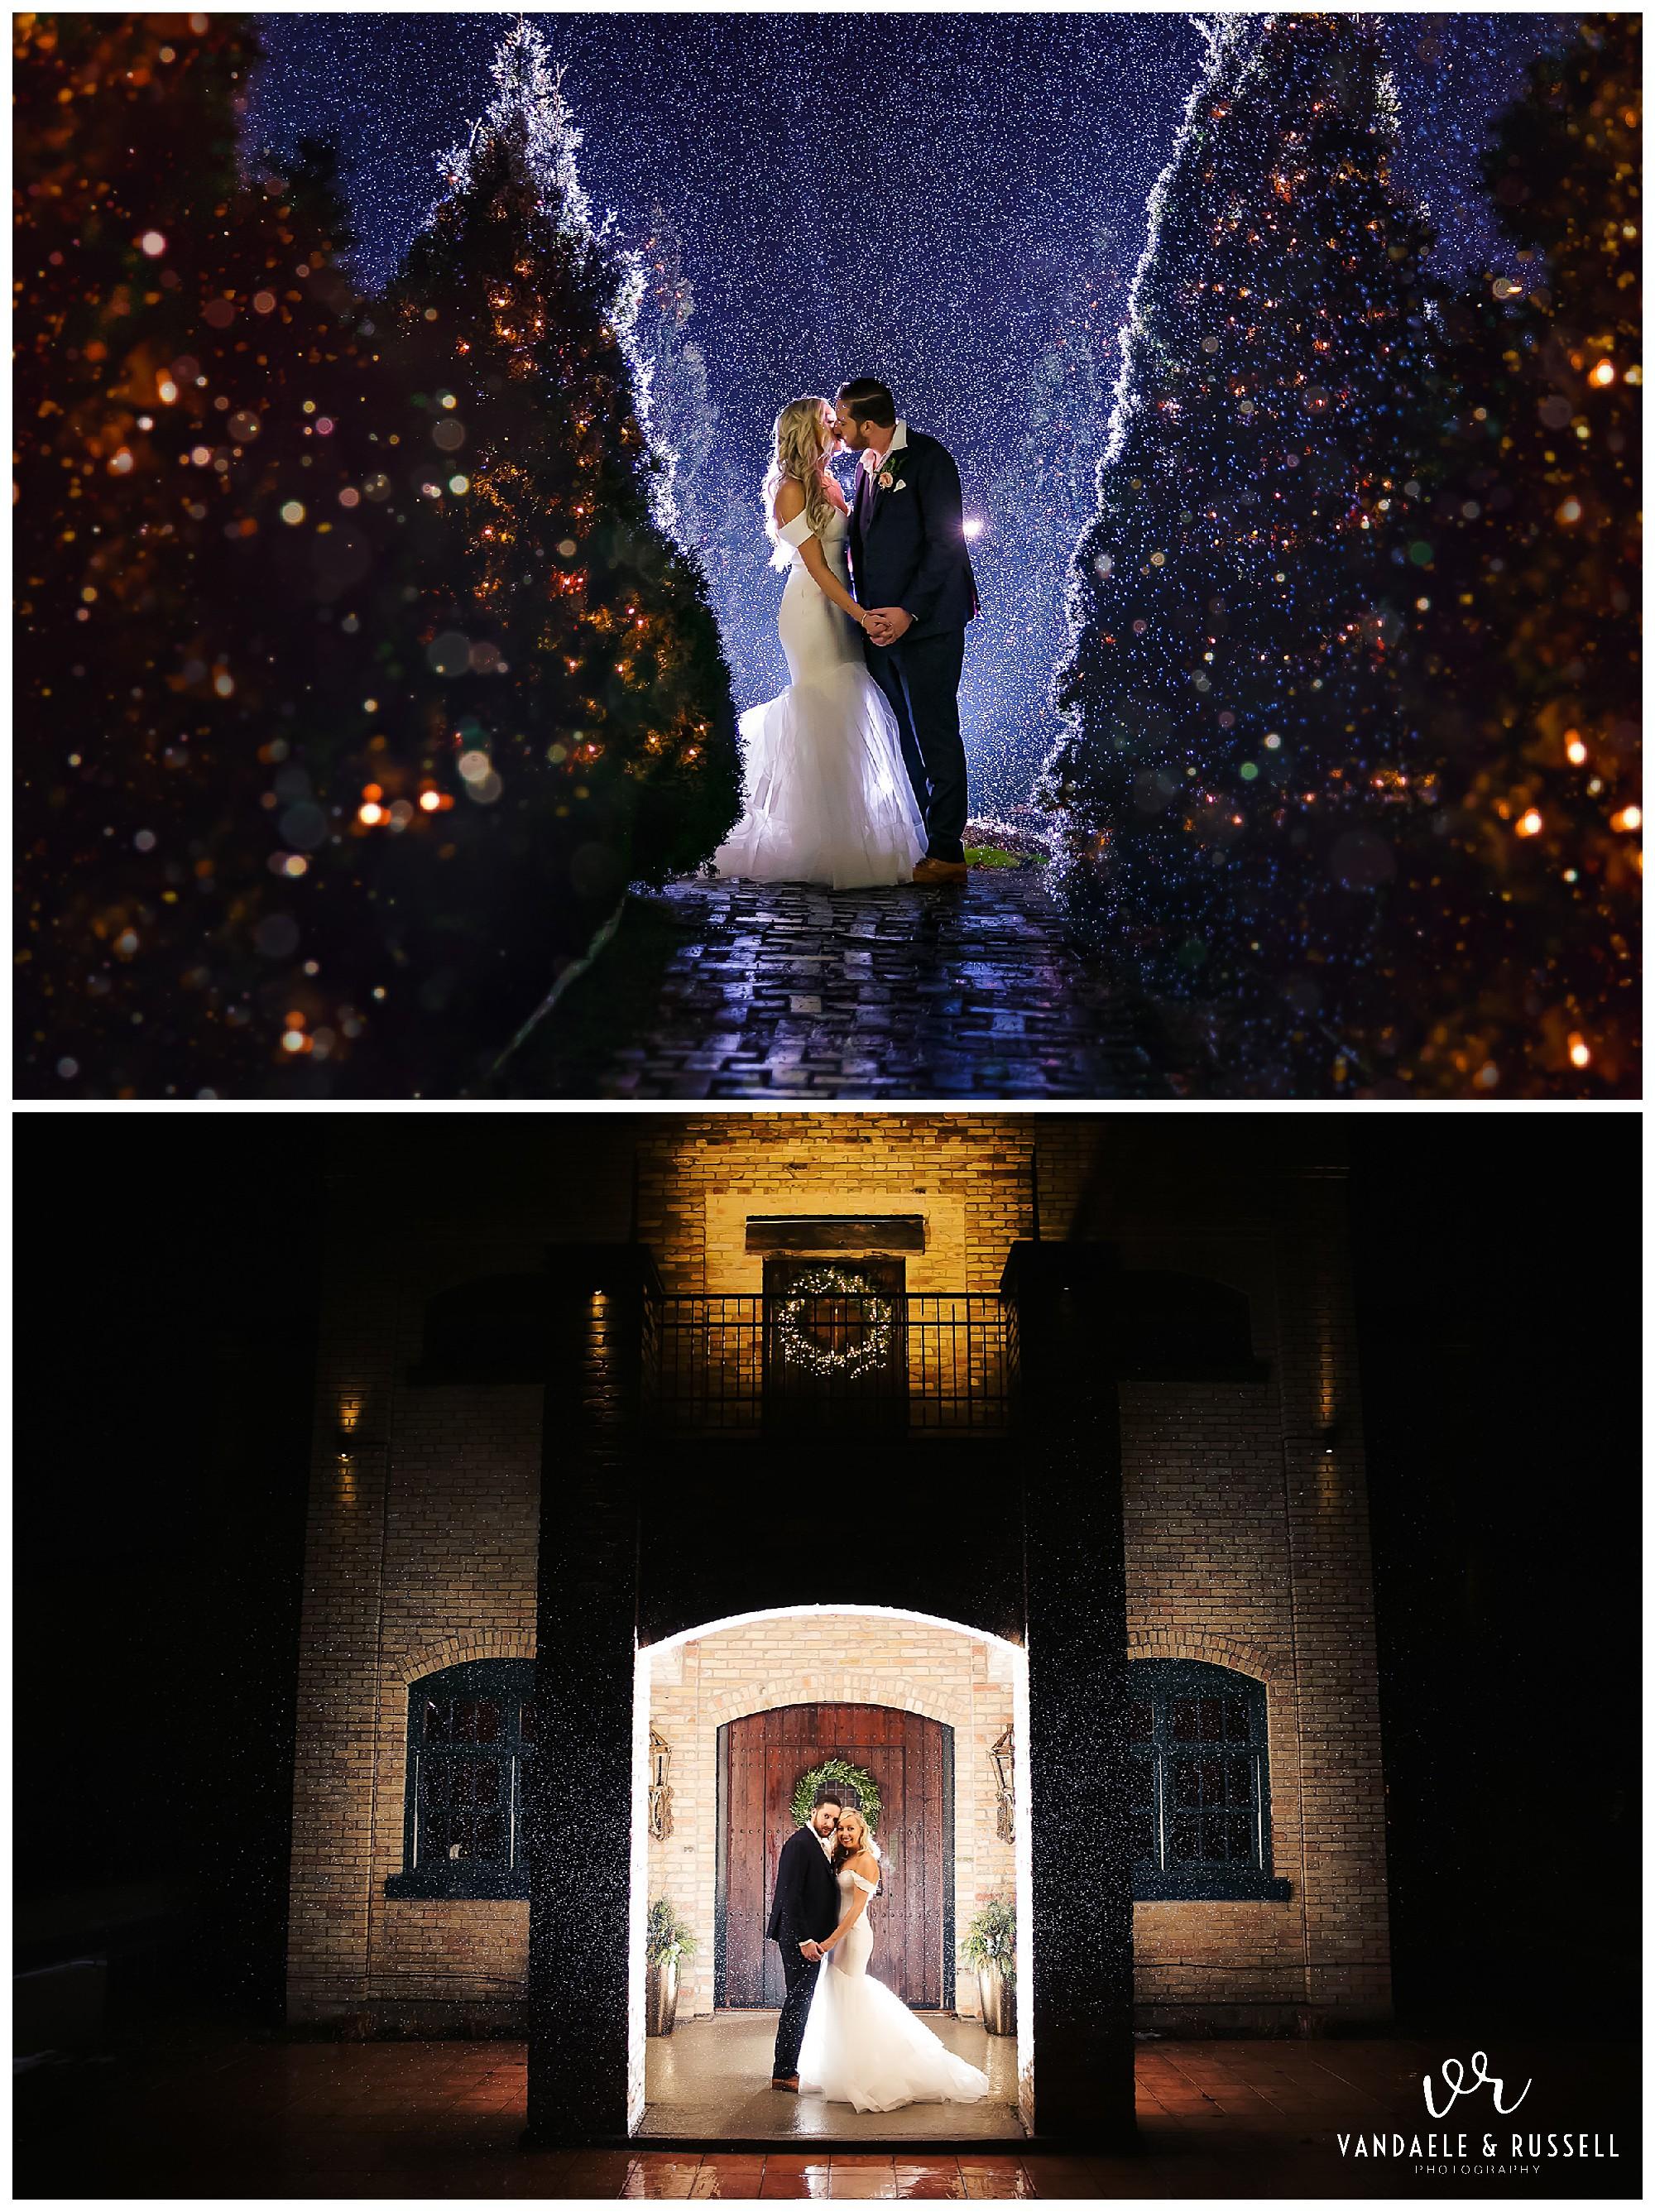 Hacienda-Sarria-Wedding-Photos-NYE-Michelle-Matt-VanDaele-Russell_0047.jpg